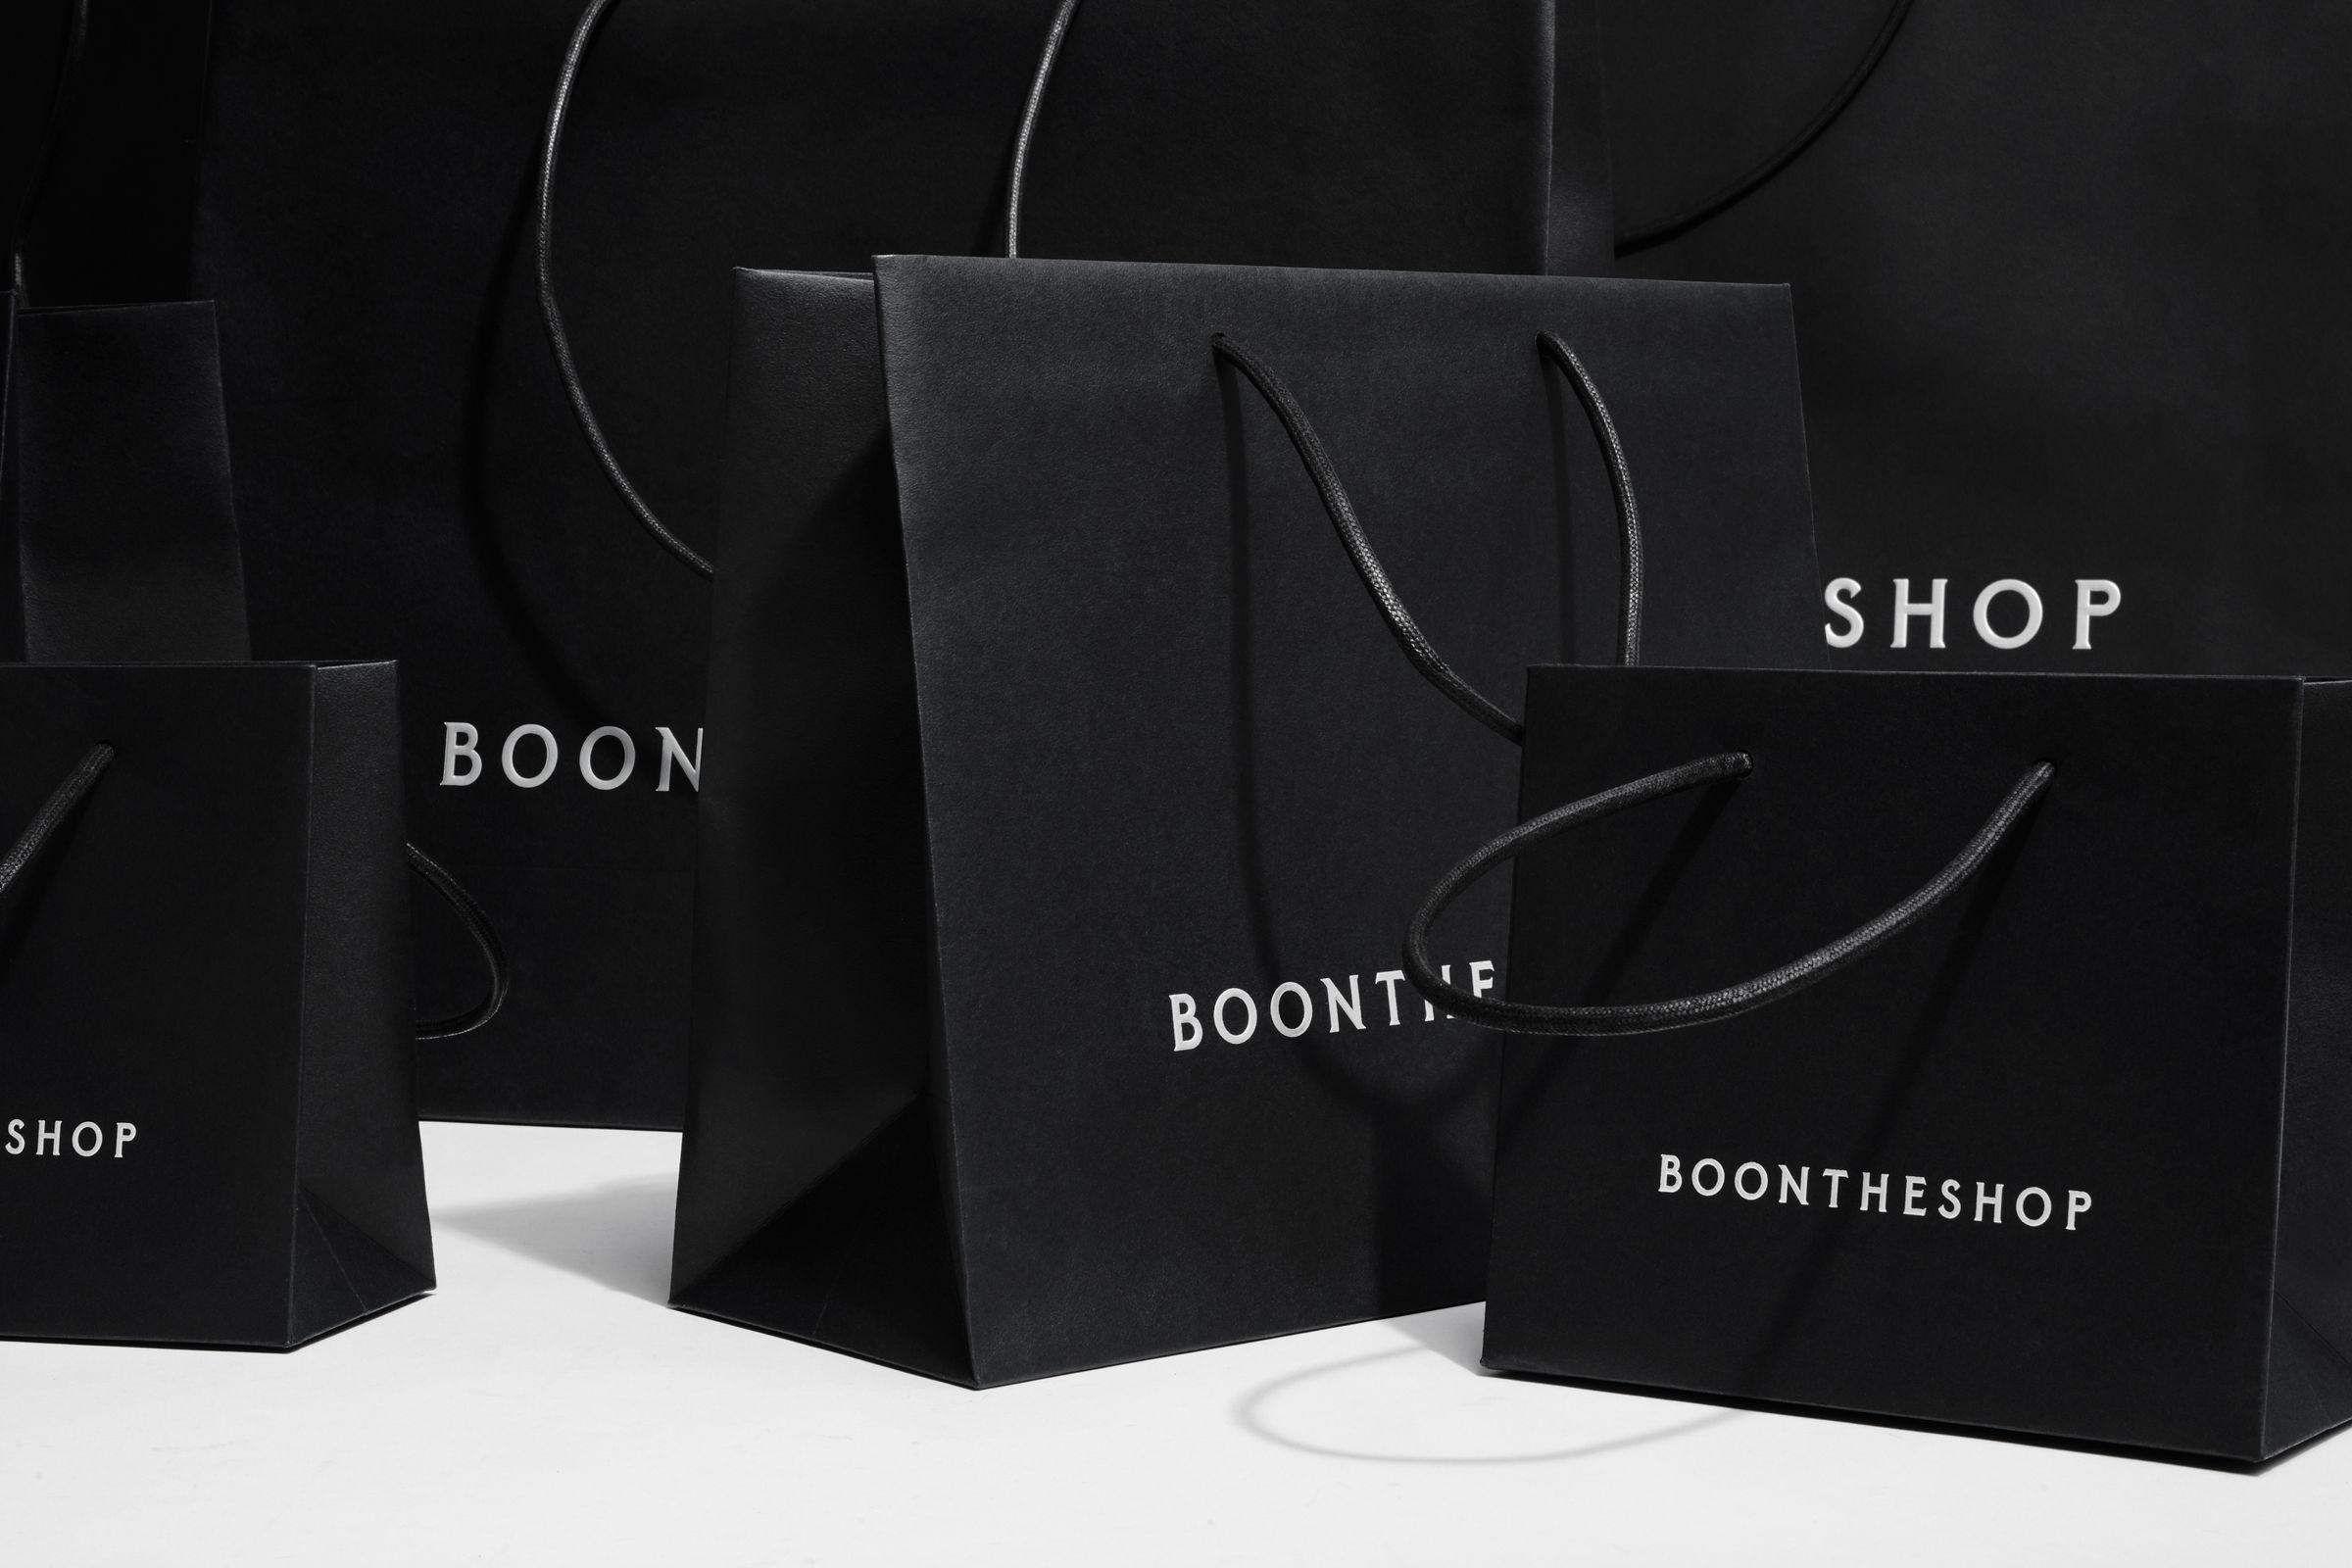 BOONTHESHOP shopping bag design